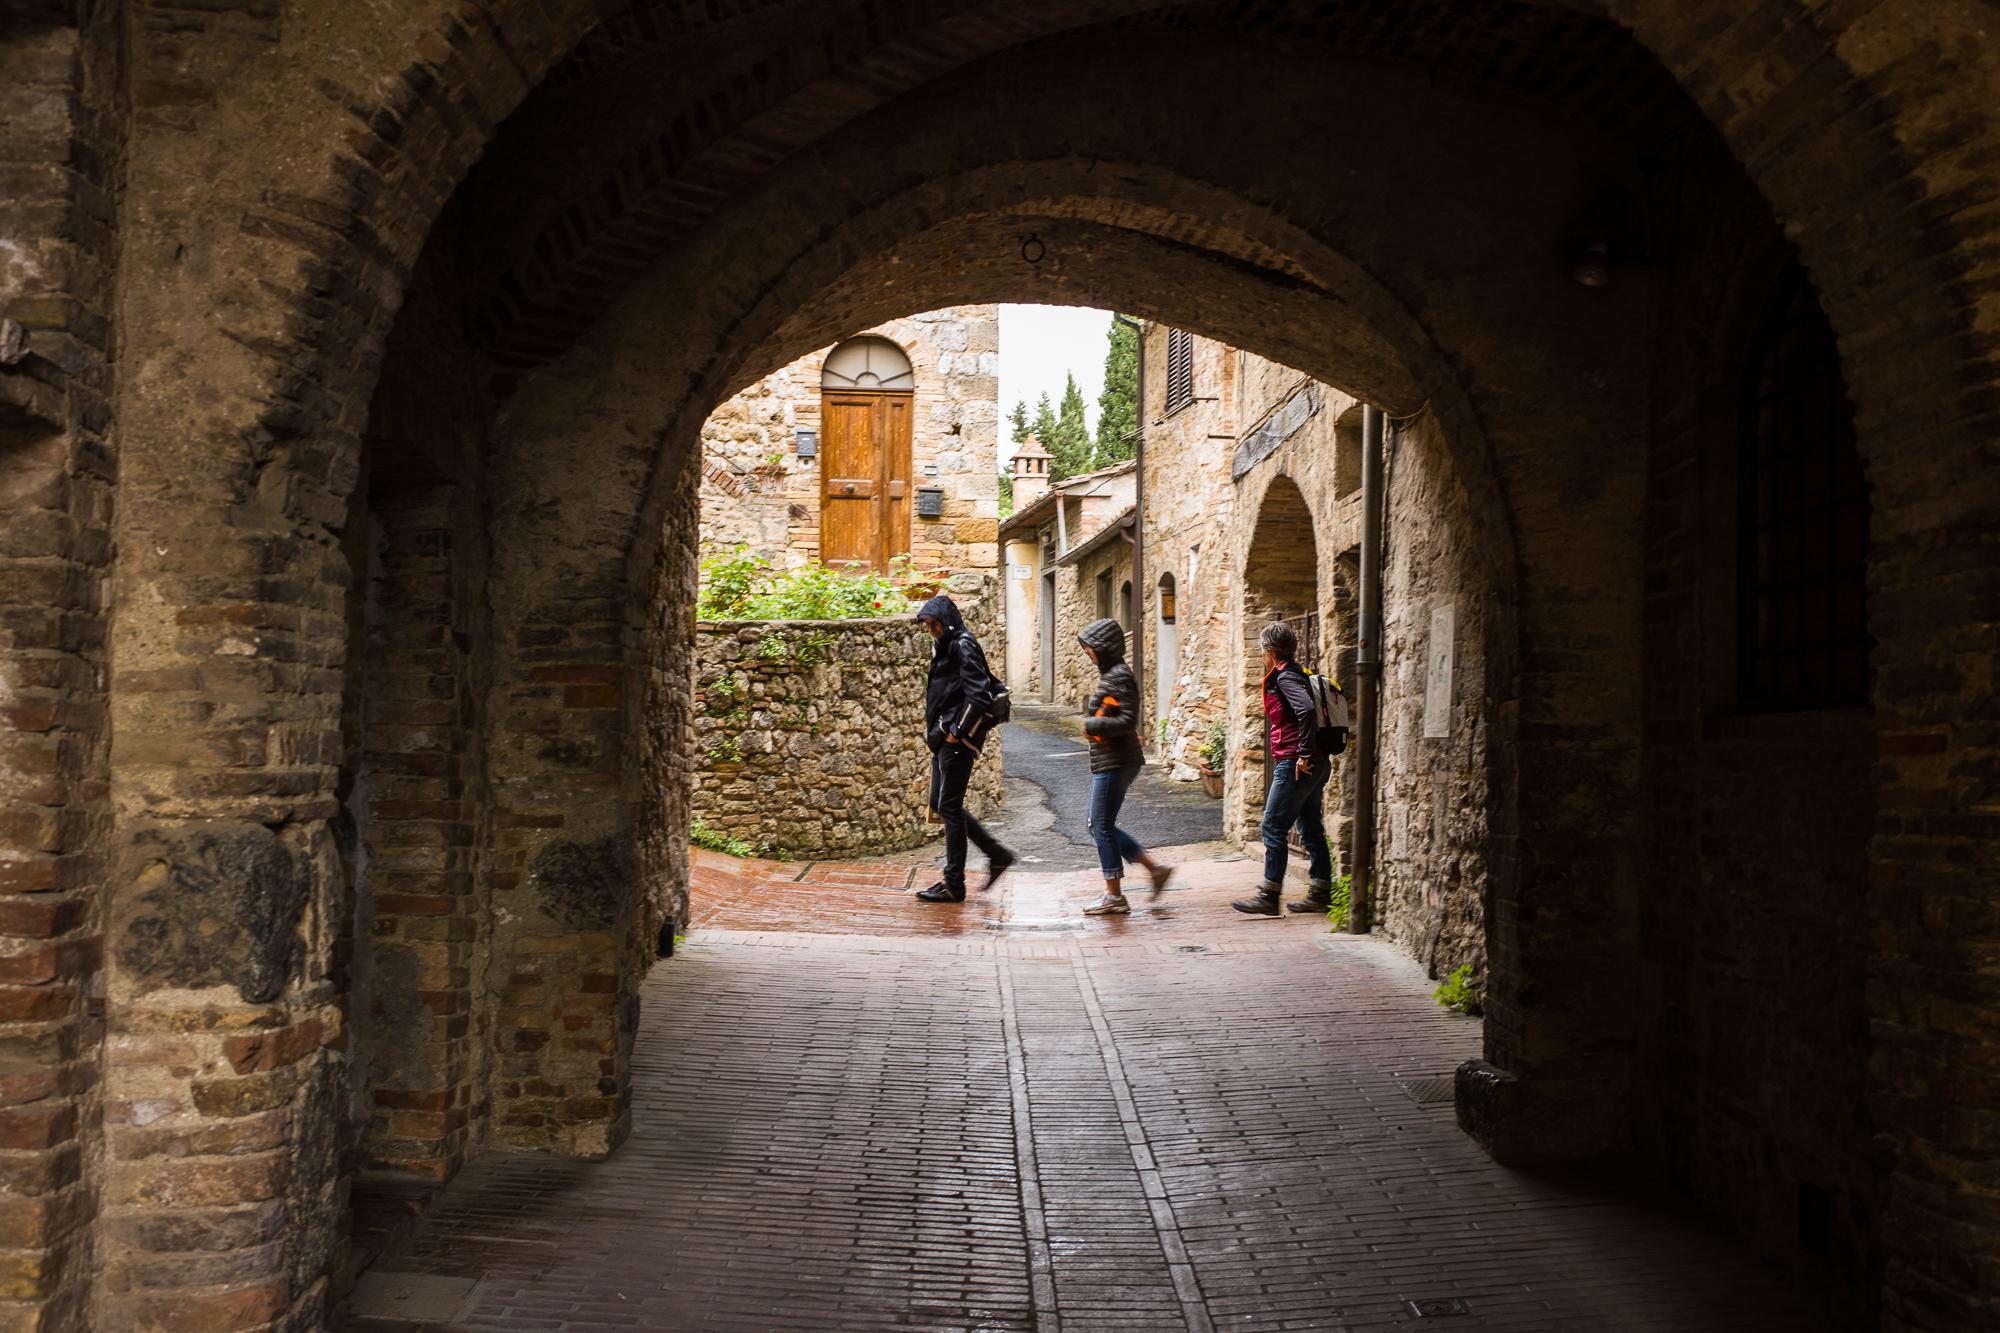 Walking through San Gimignano